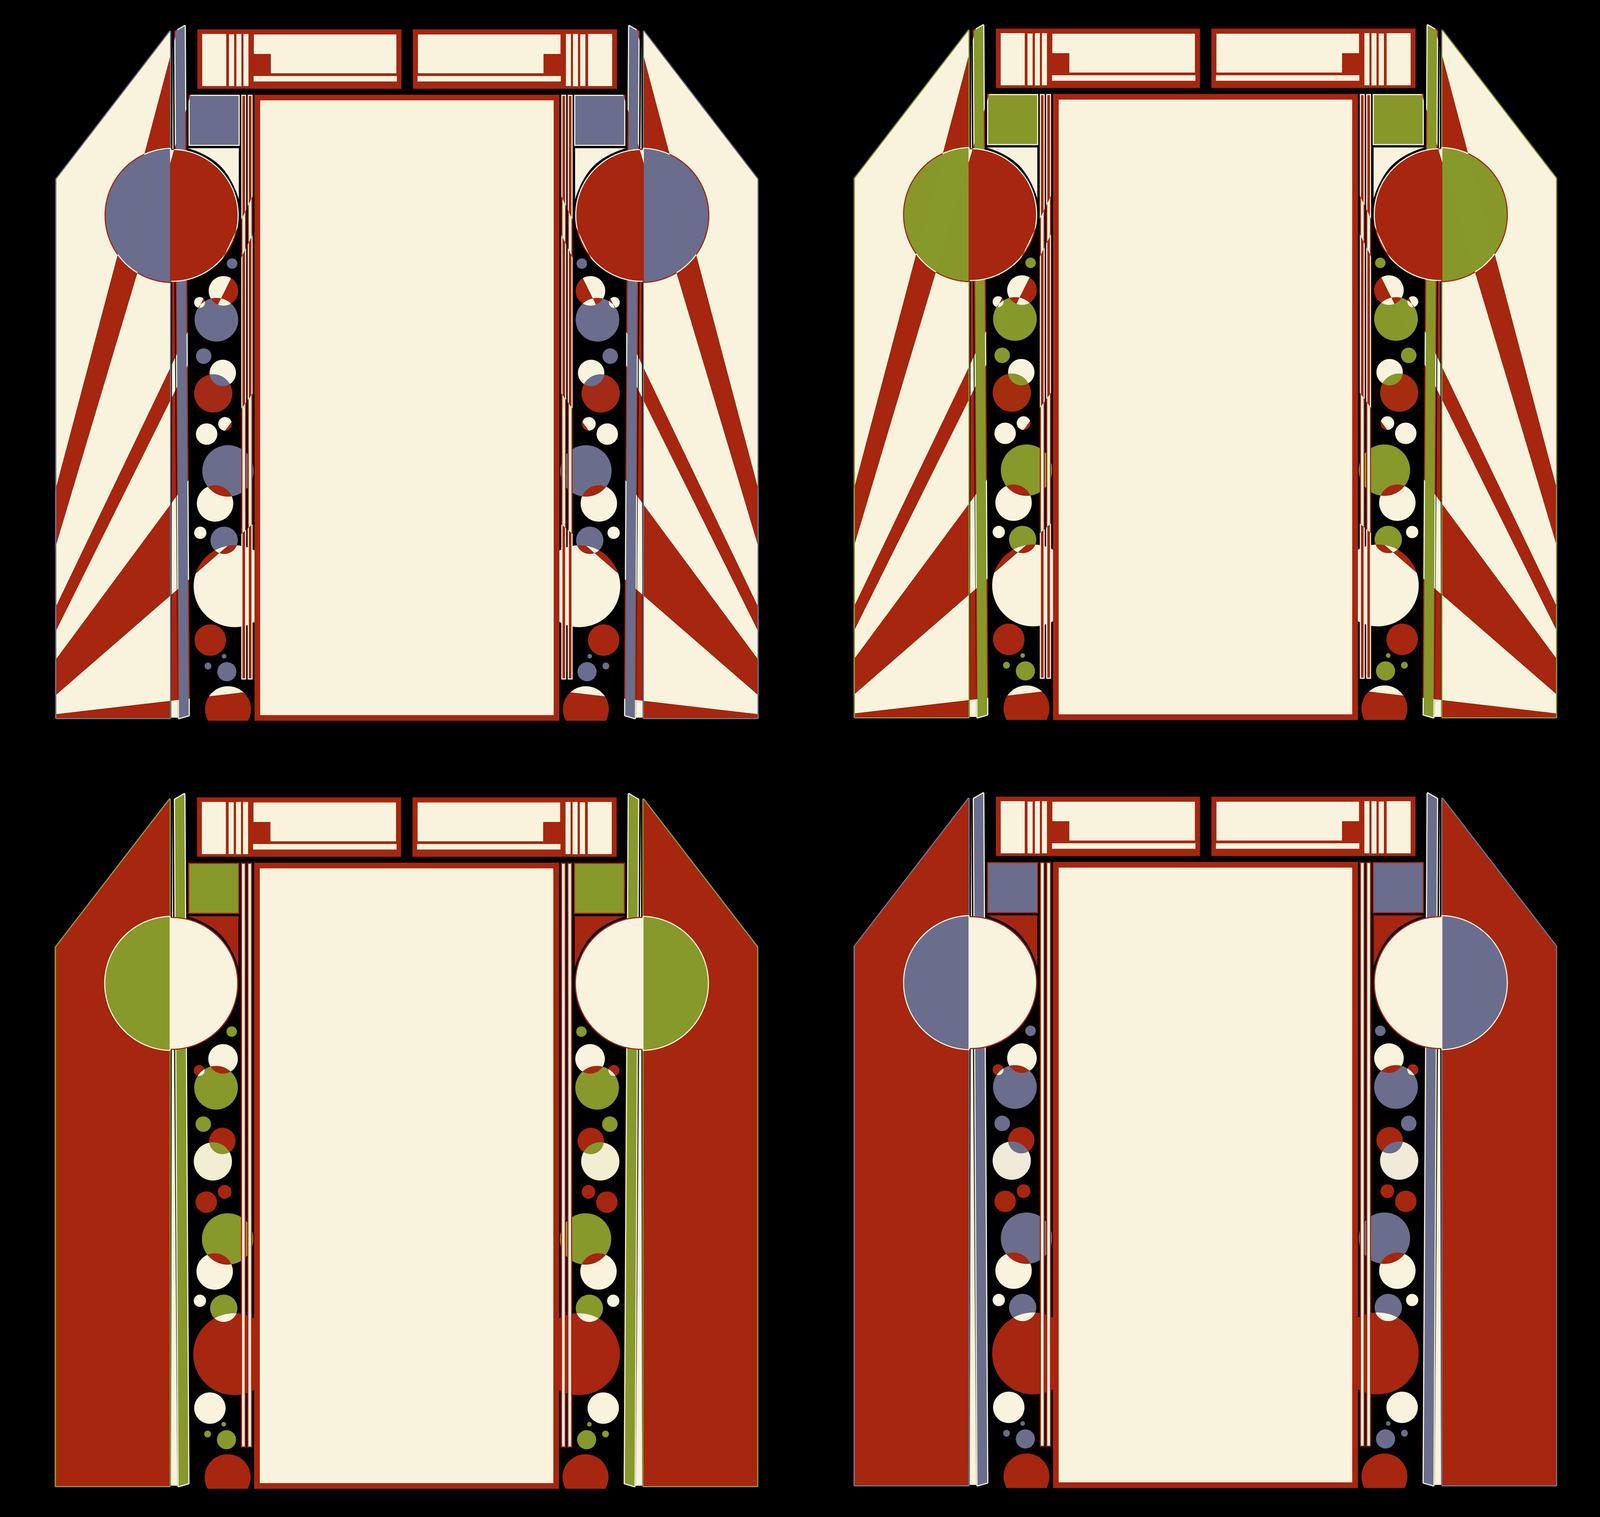 Designs Interfaces Other 2009 2015 Leminnes Art Deco Design For A Door